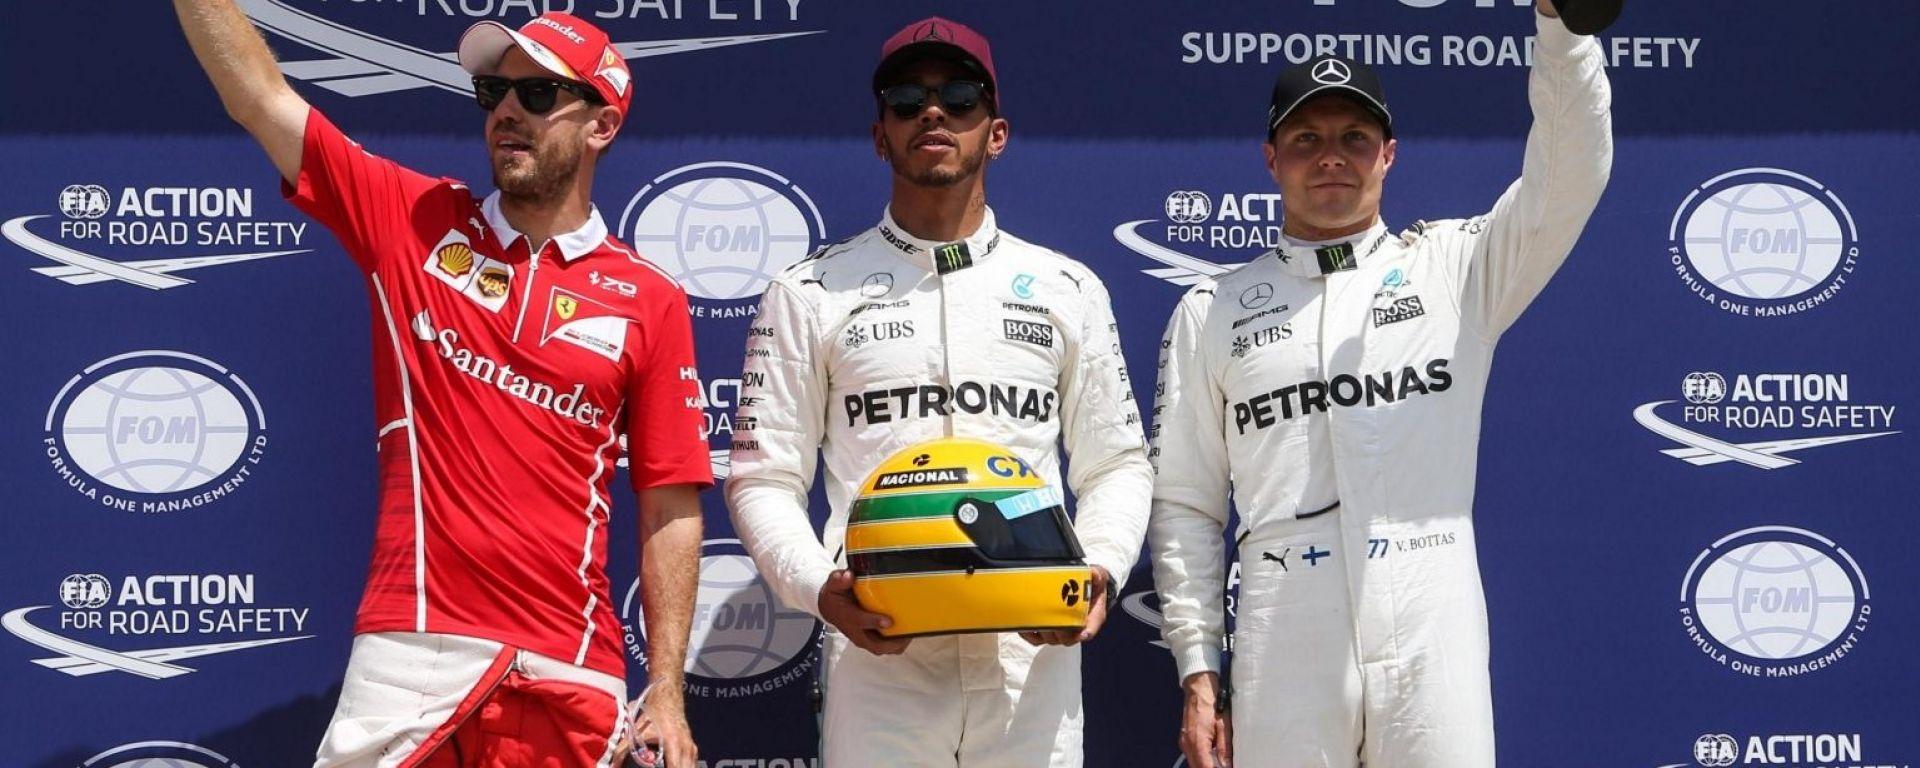 F1 2017 GP Canada